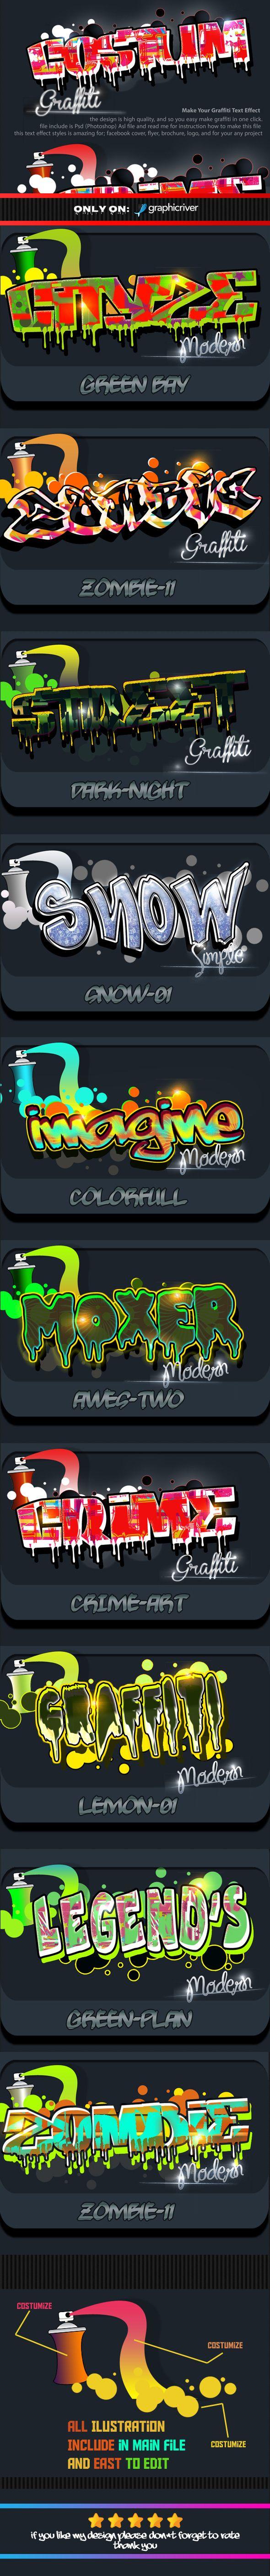 Costum Graffiti Text Effect Styles. Download here: http://graphicriver.net/item/costum-graffiti-text-effect-styles-vol-2/14403480?ref=ksioks